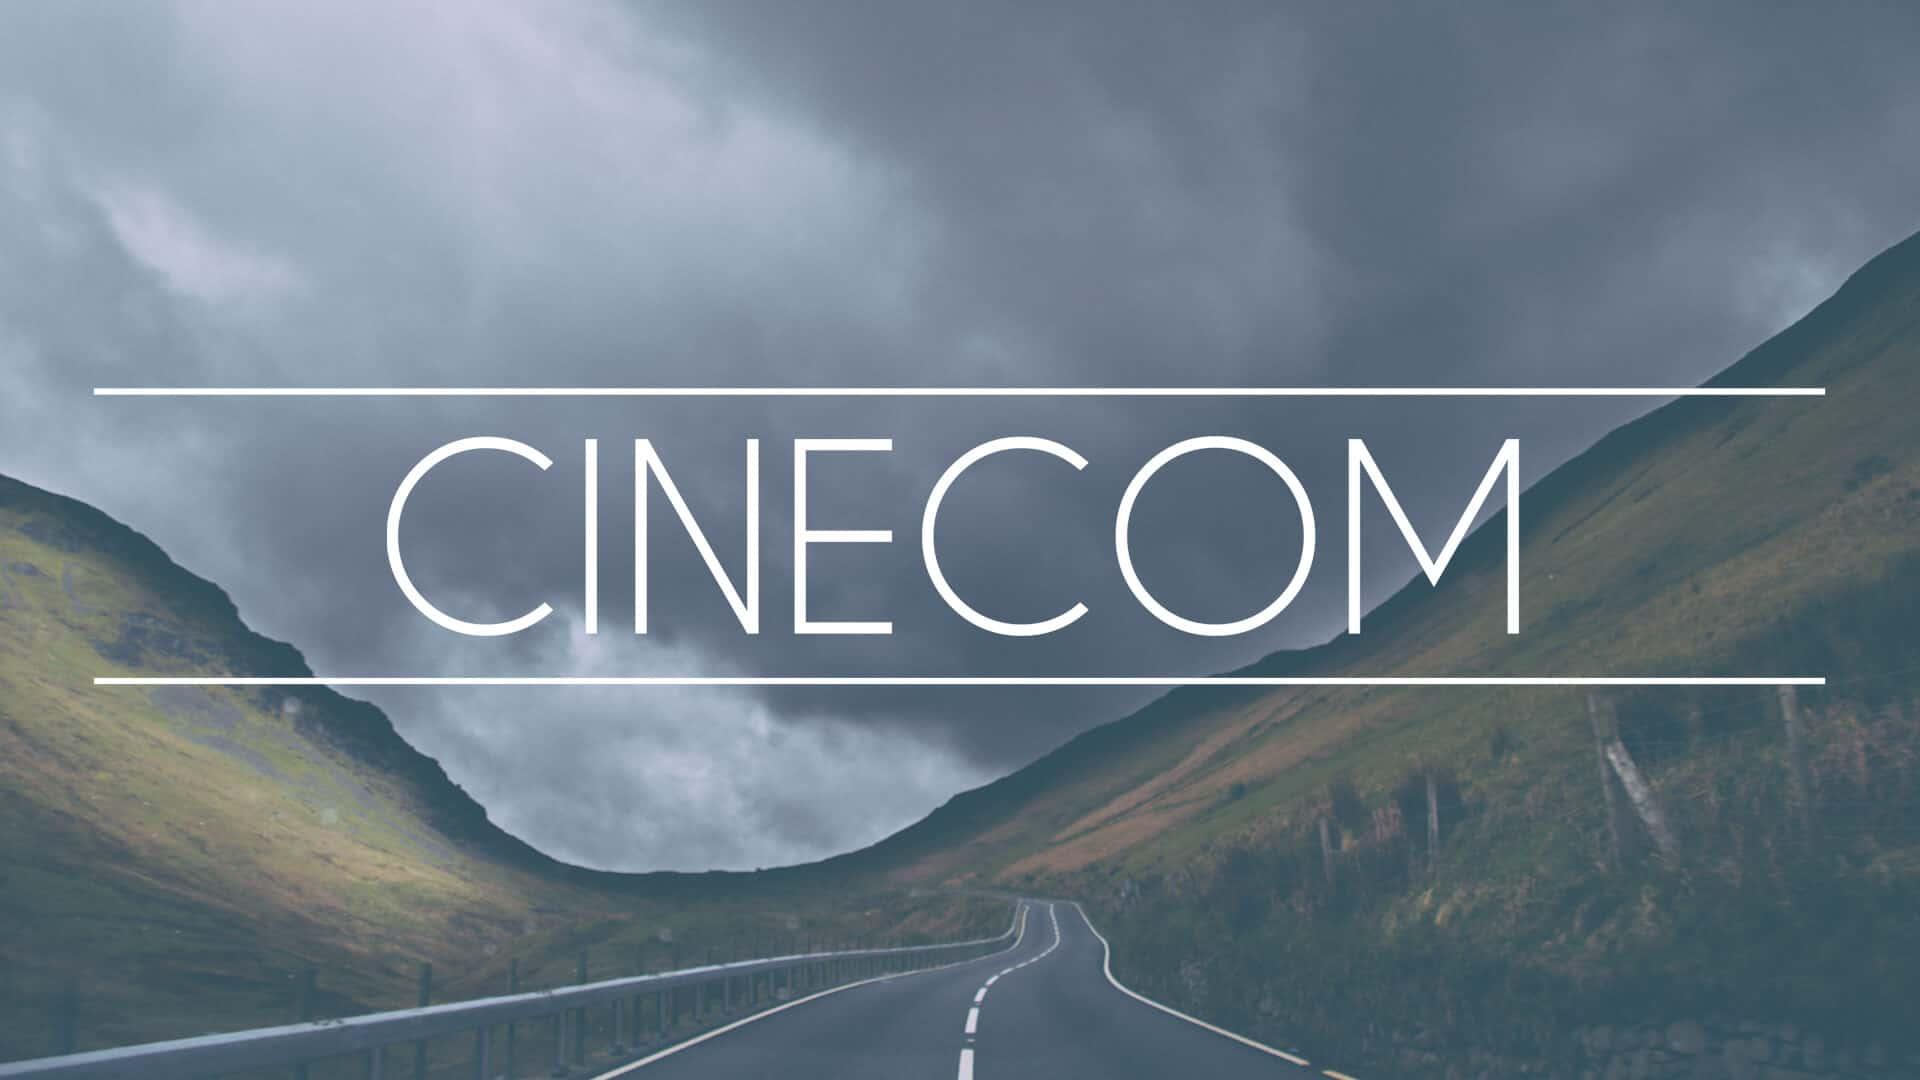 Free Stylish Premiere Pro Title Templates